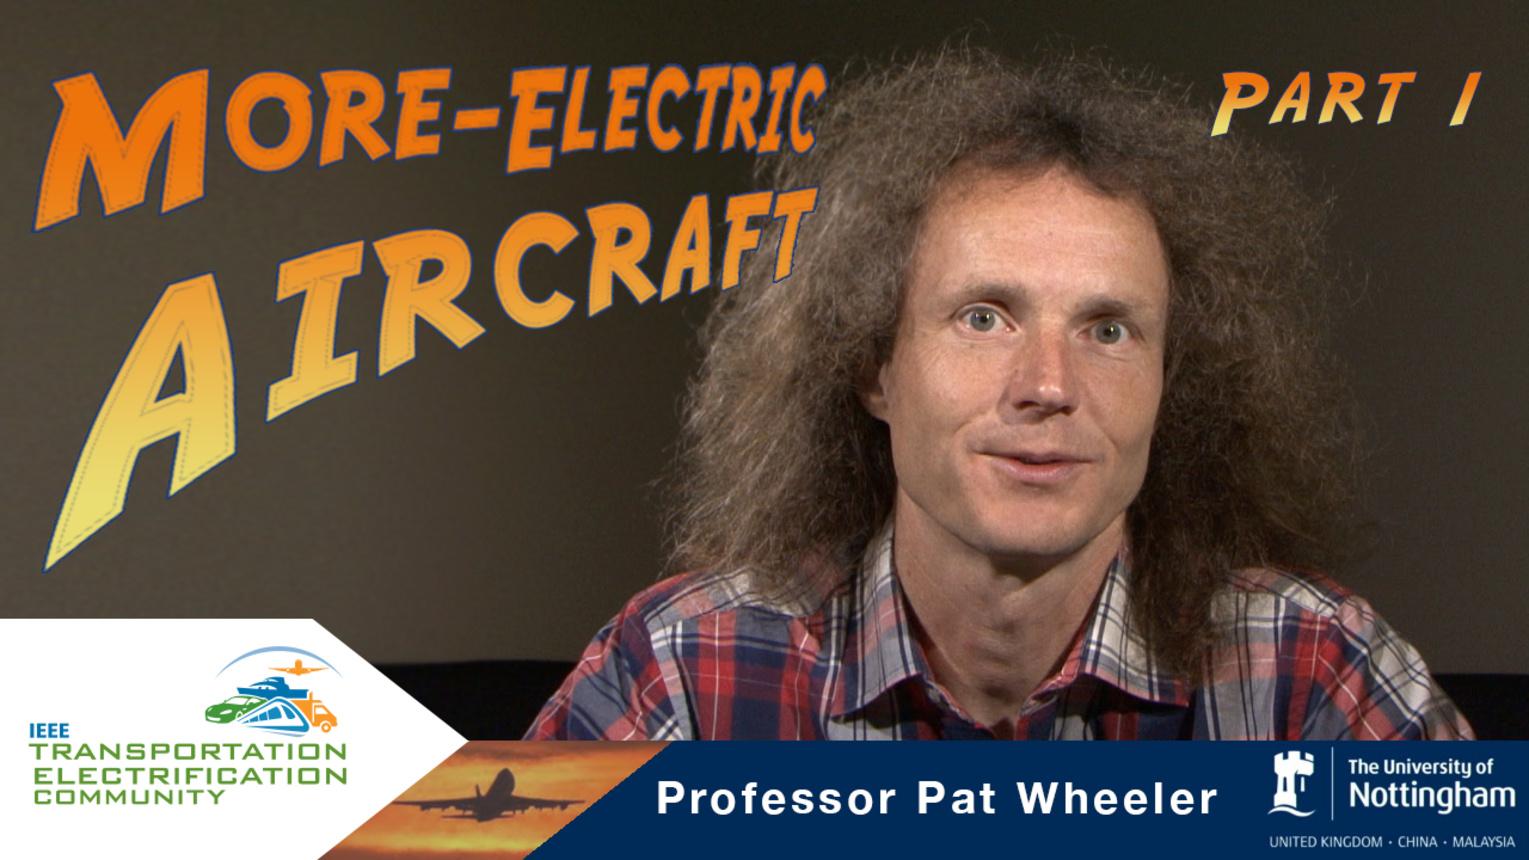 ECCE-2015- Pat Wheeler - More Electric Aircraft - Part 1